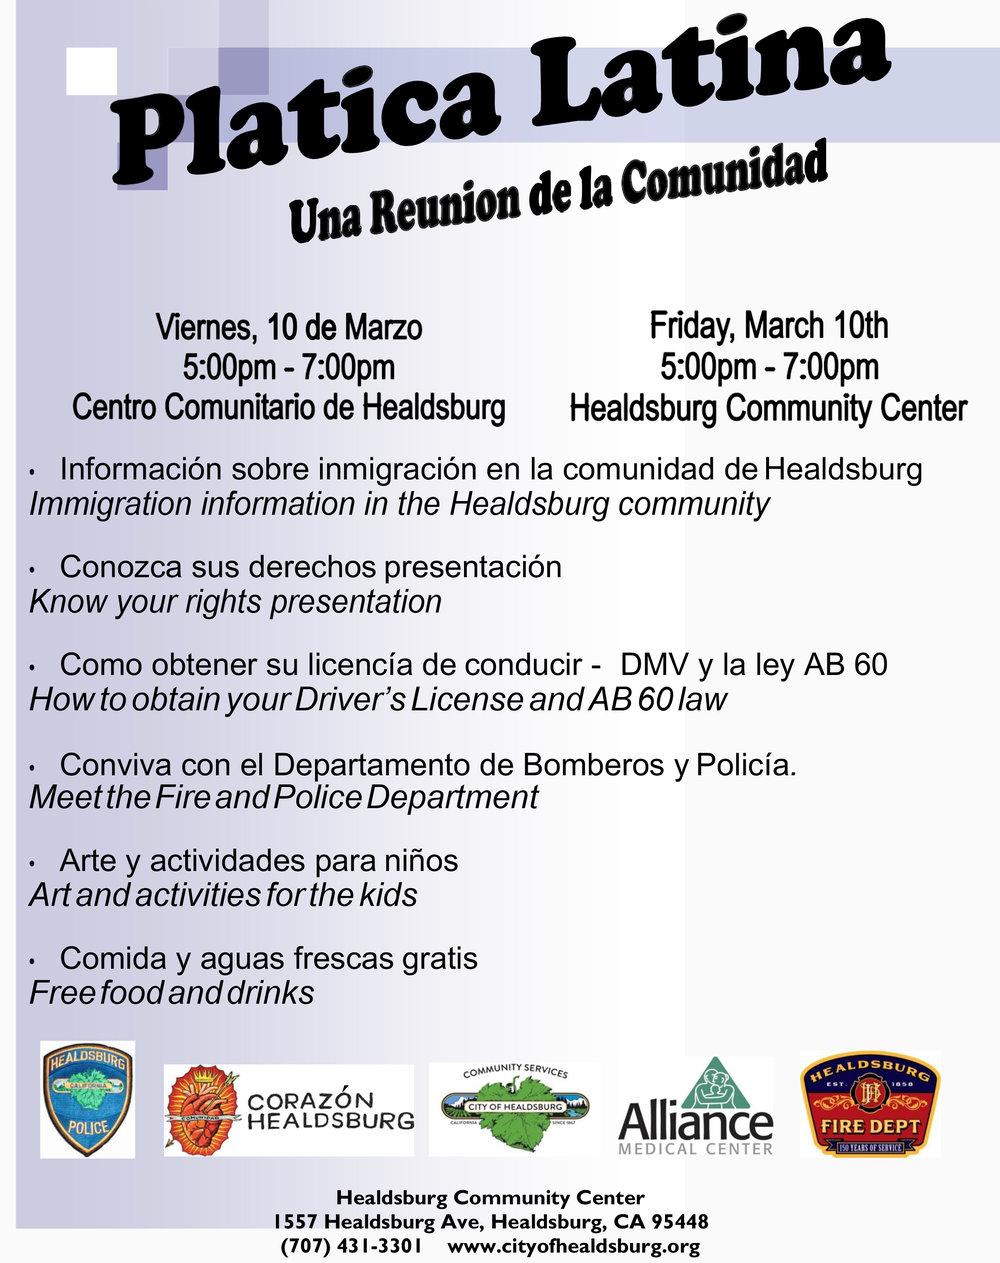 Platica Latina_March 10.jpg